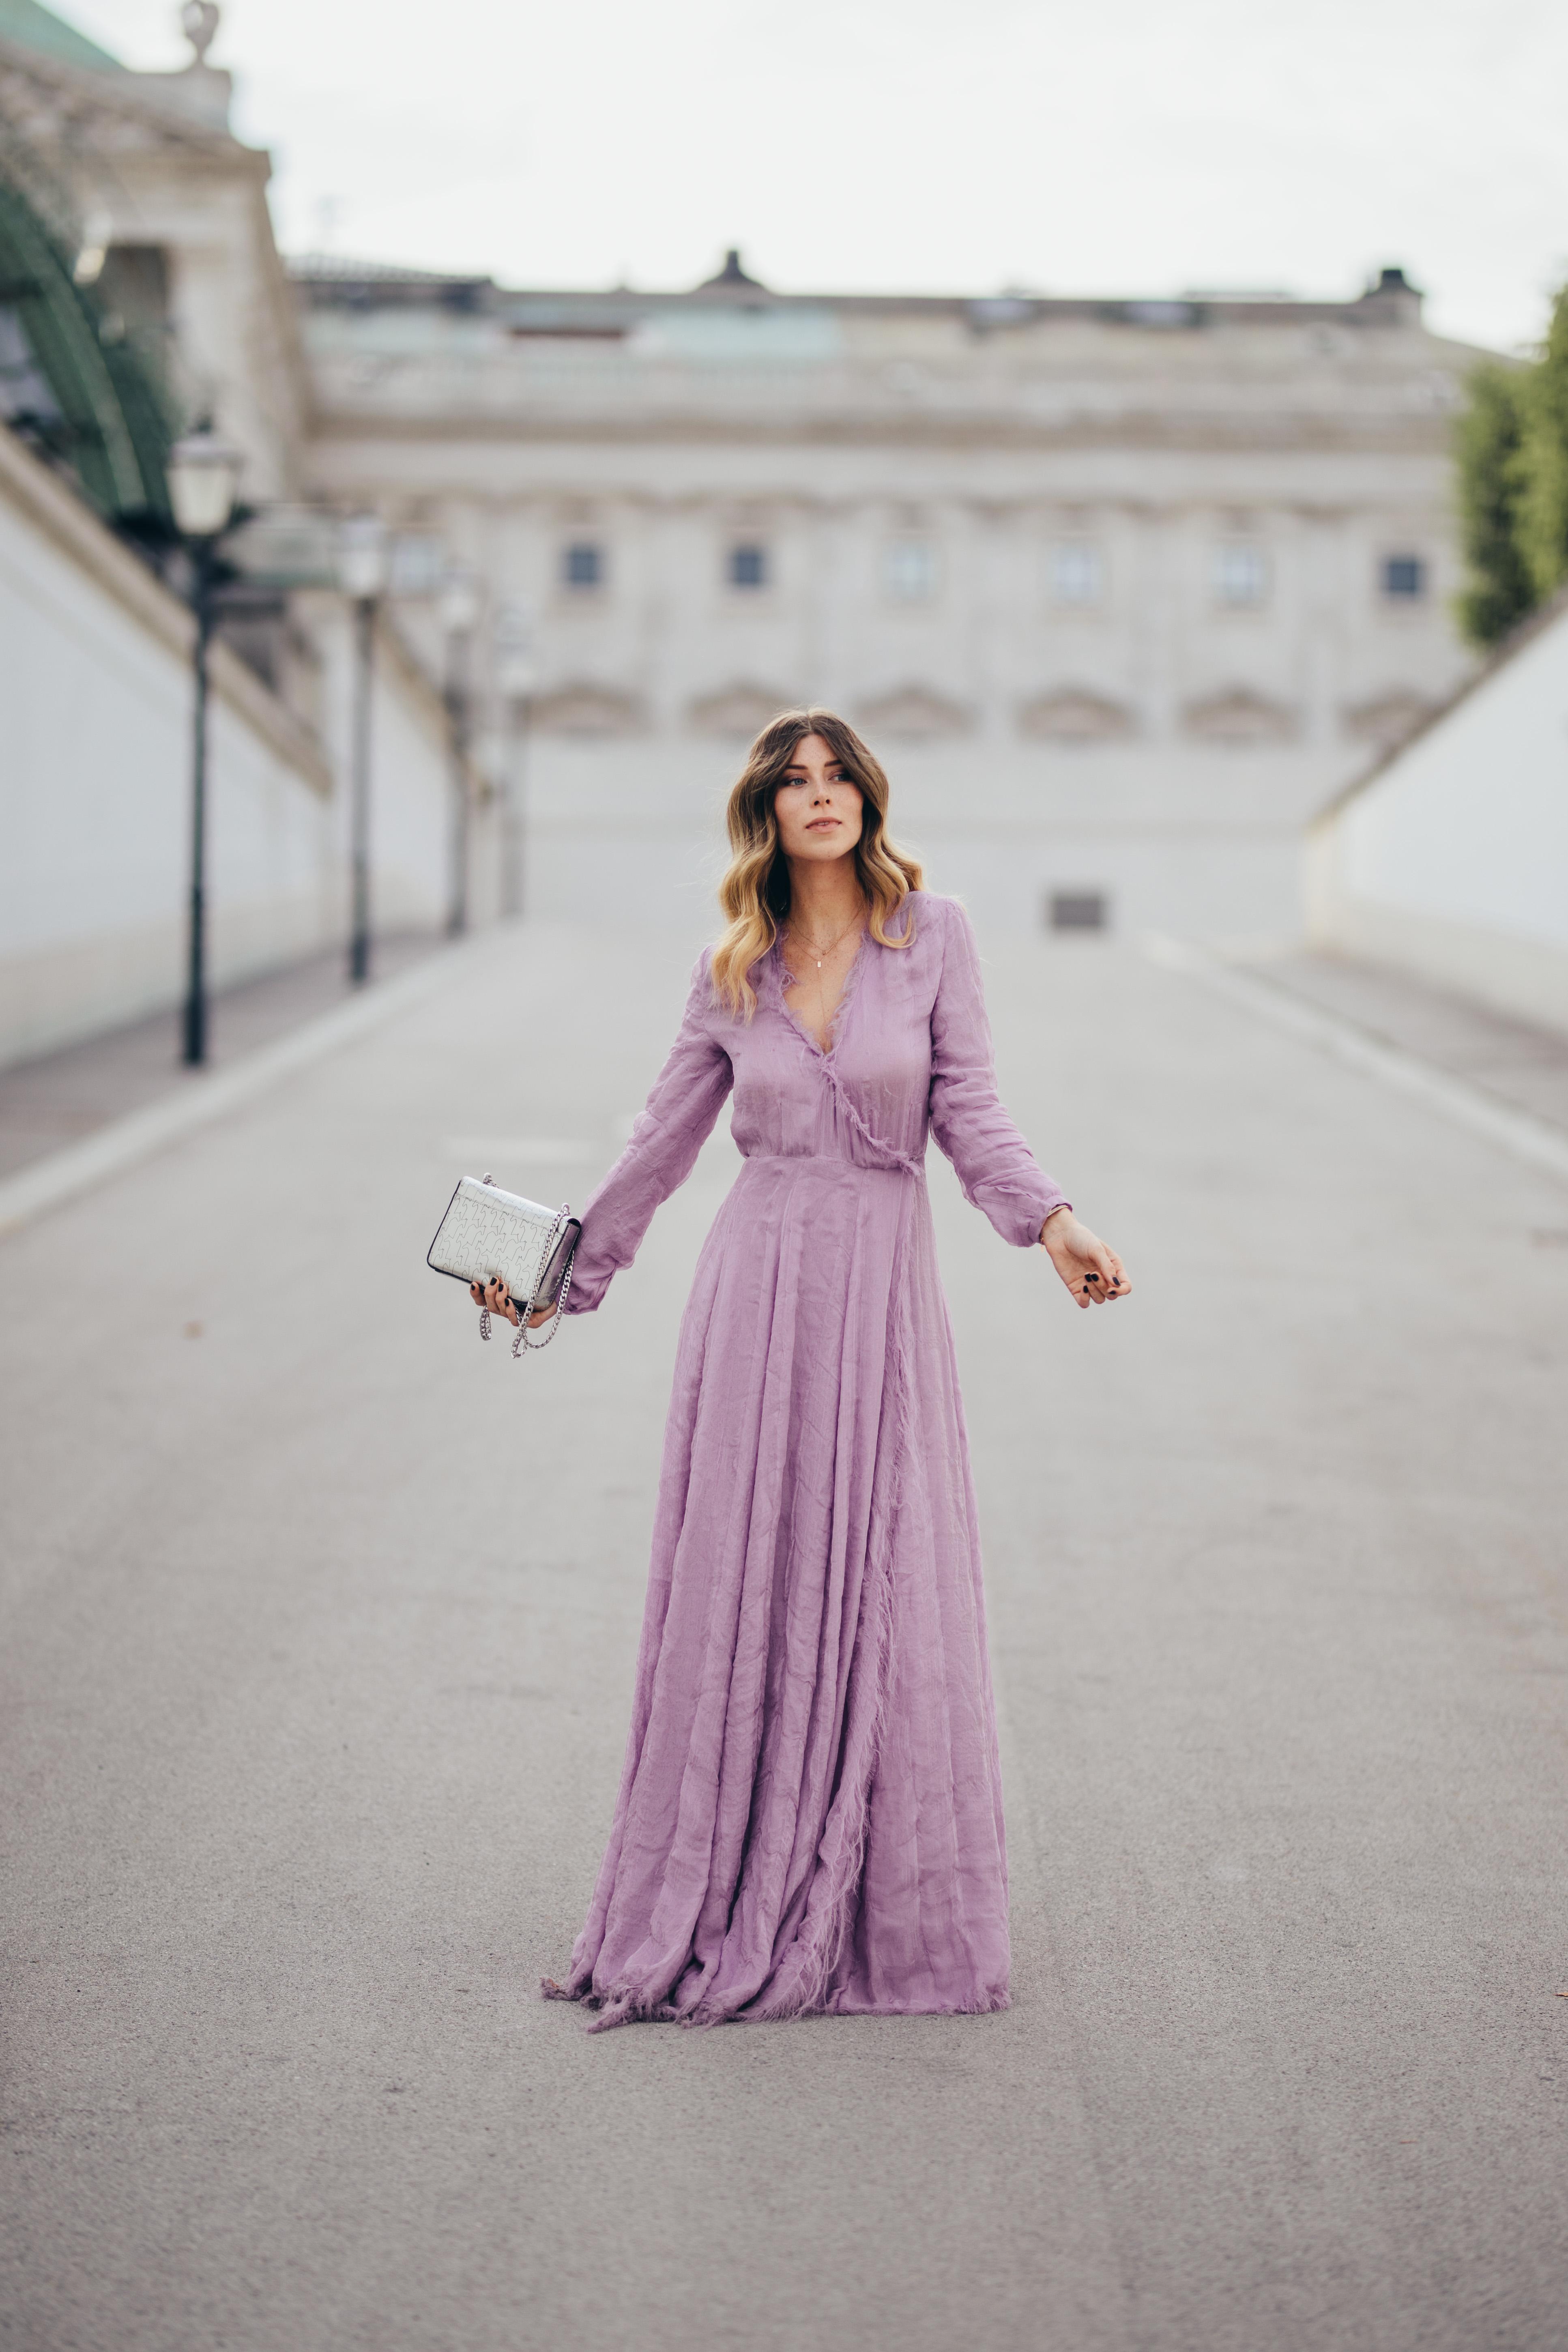 Fête Imperiale Vienna 2017: Aigner Lucy Bag | Bikinis & Passports